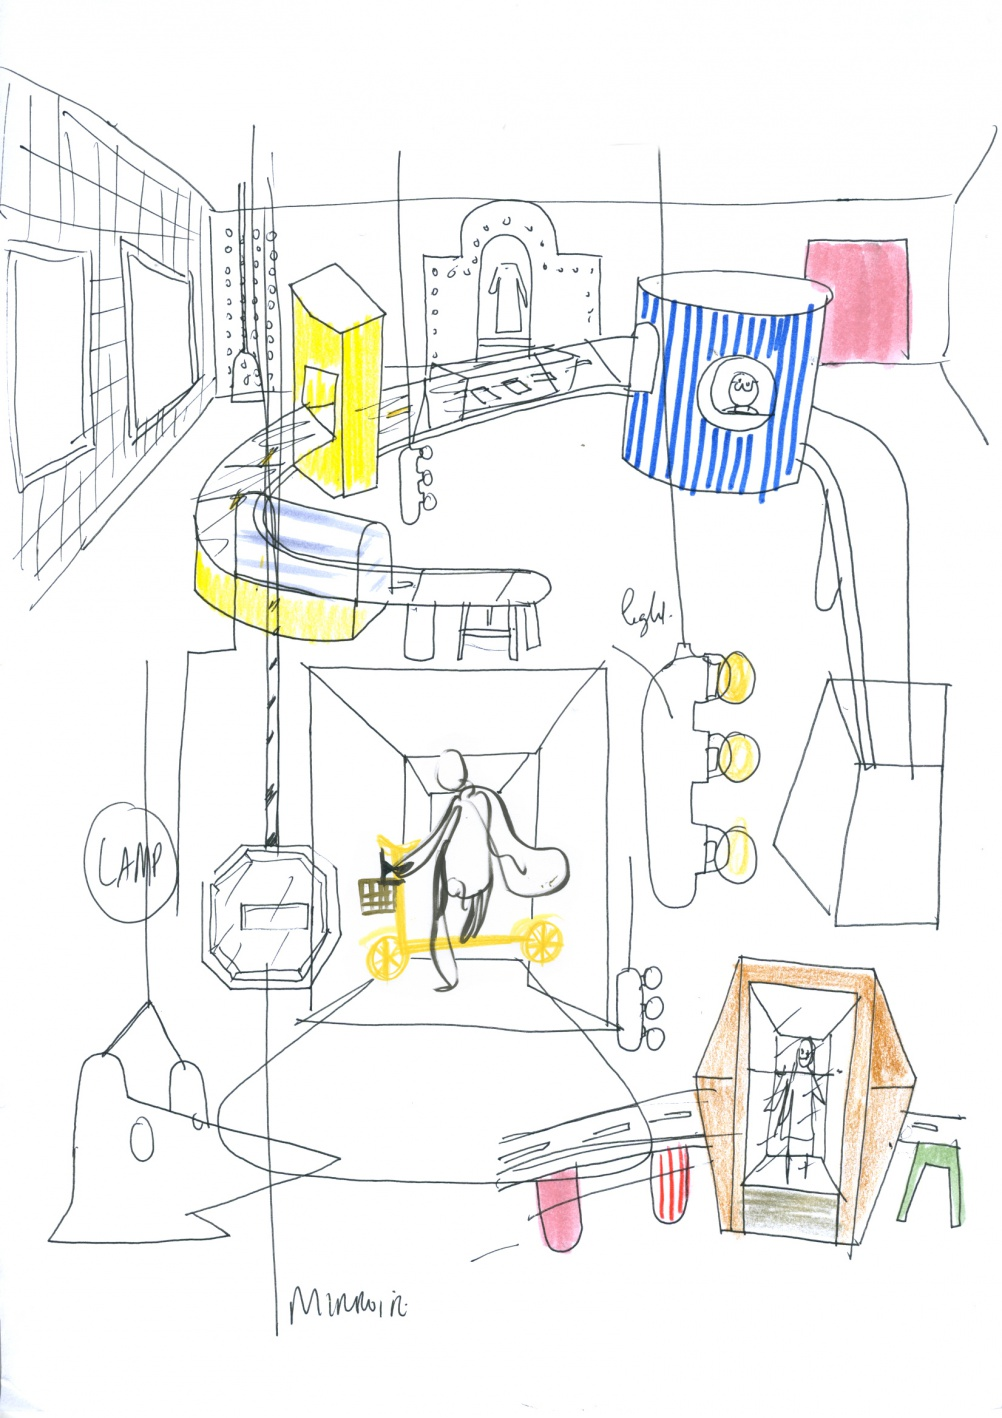 Urban Perspectives sketch by Jaime Hayon